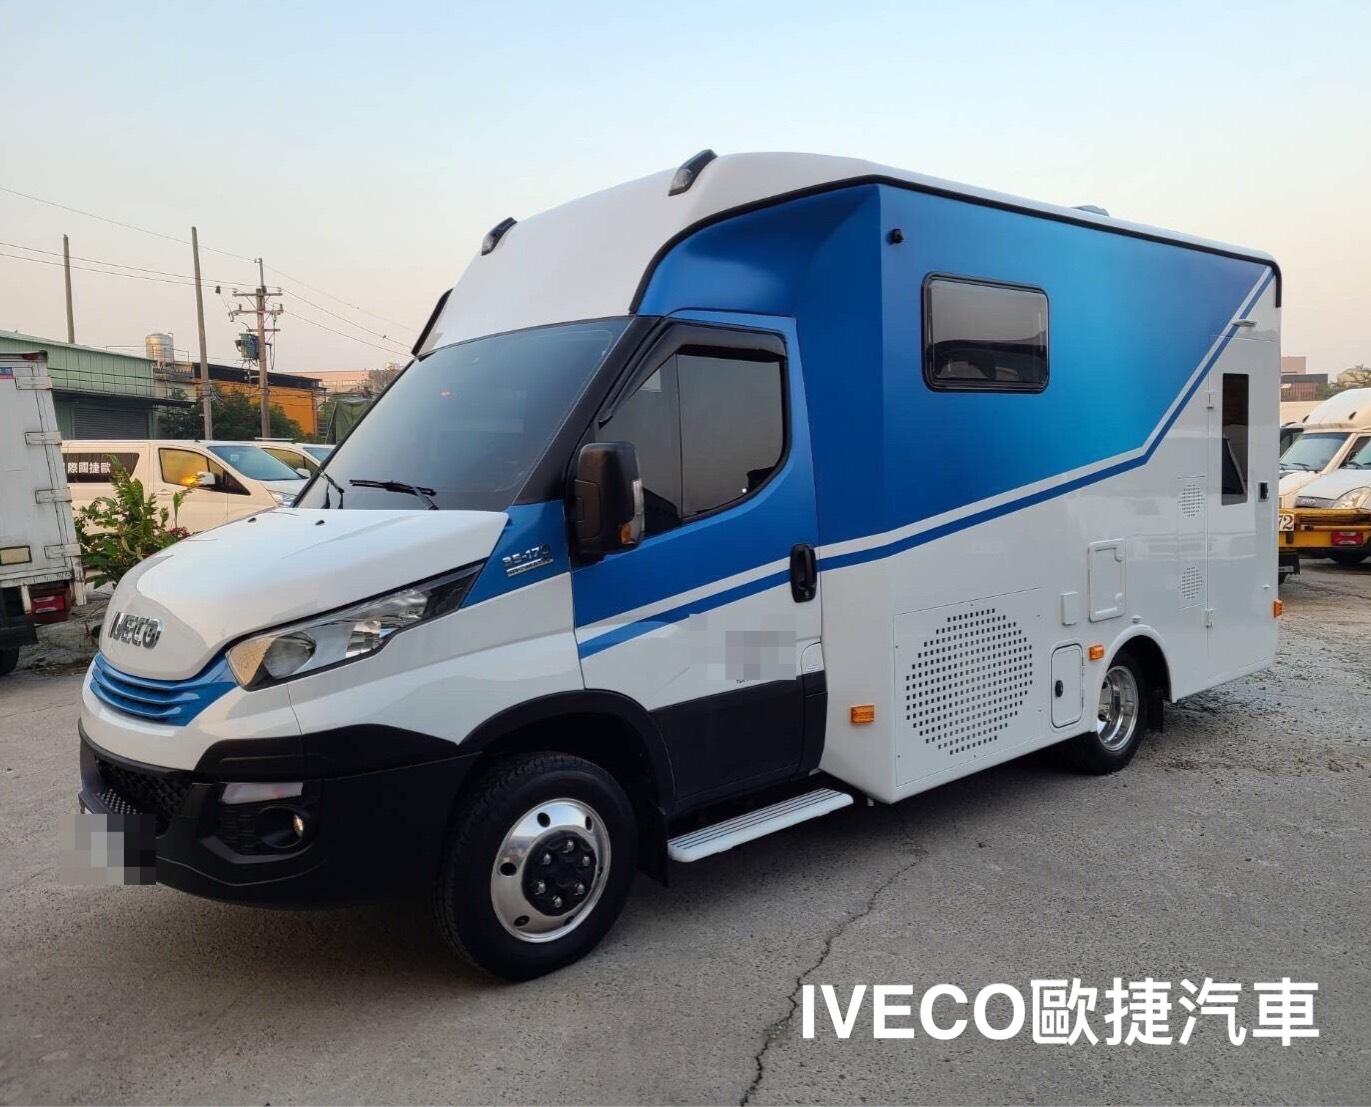 IVECO白色+藍色露營車側面